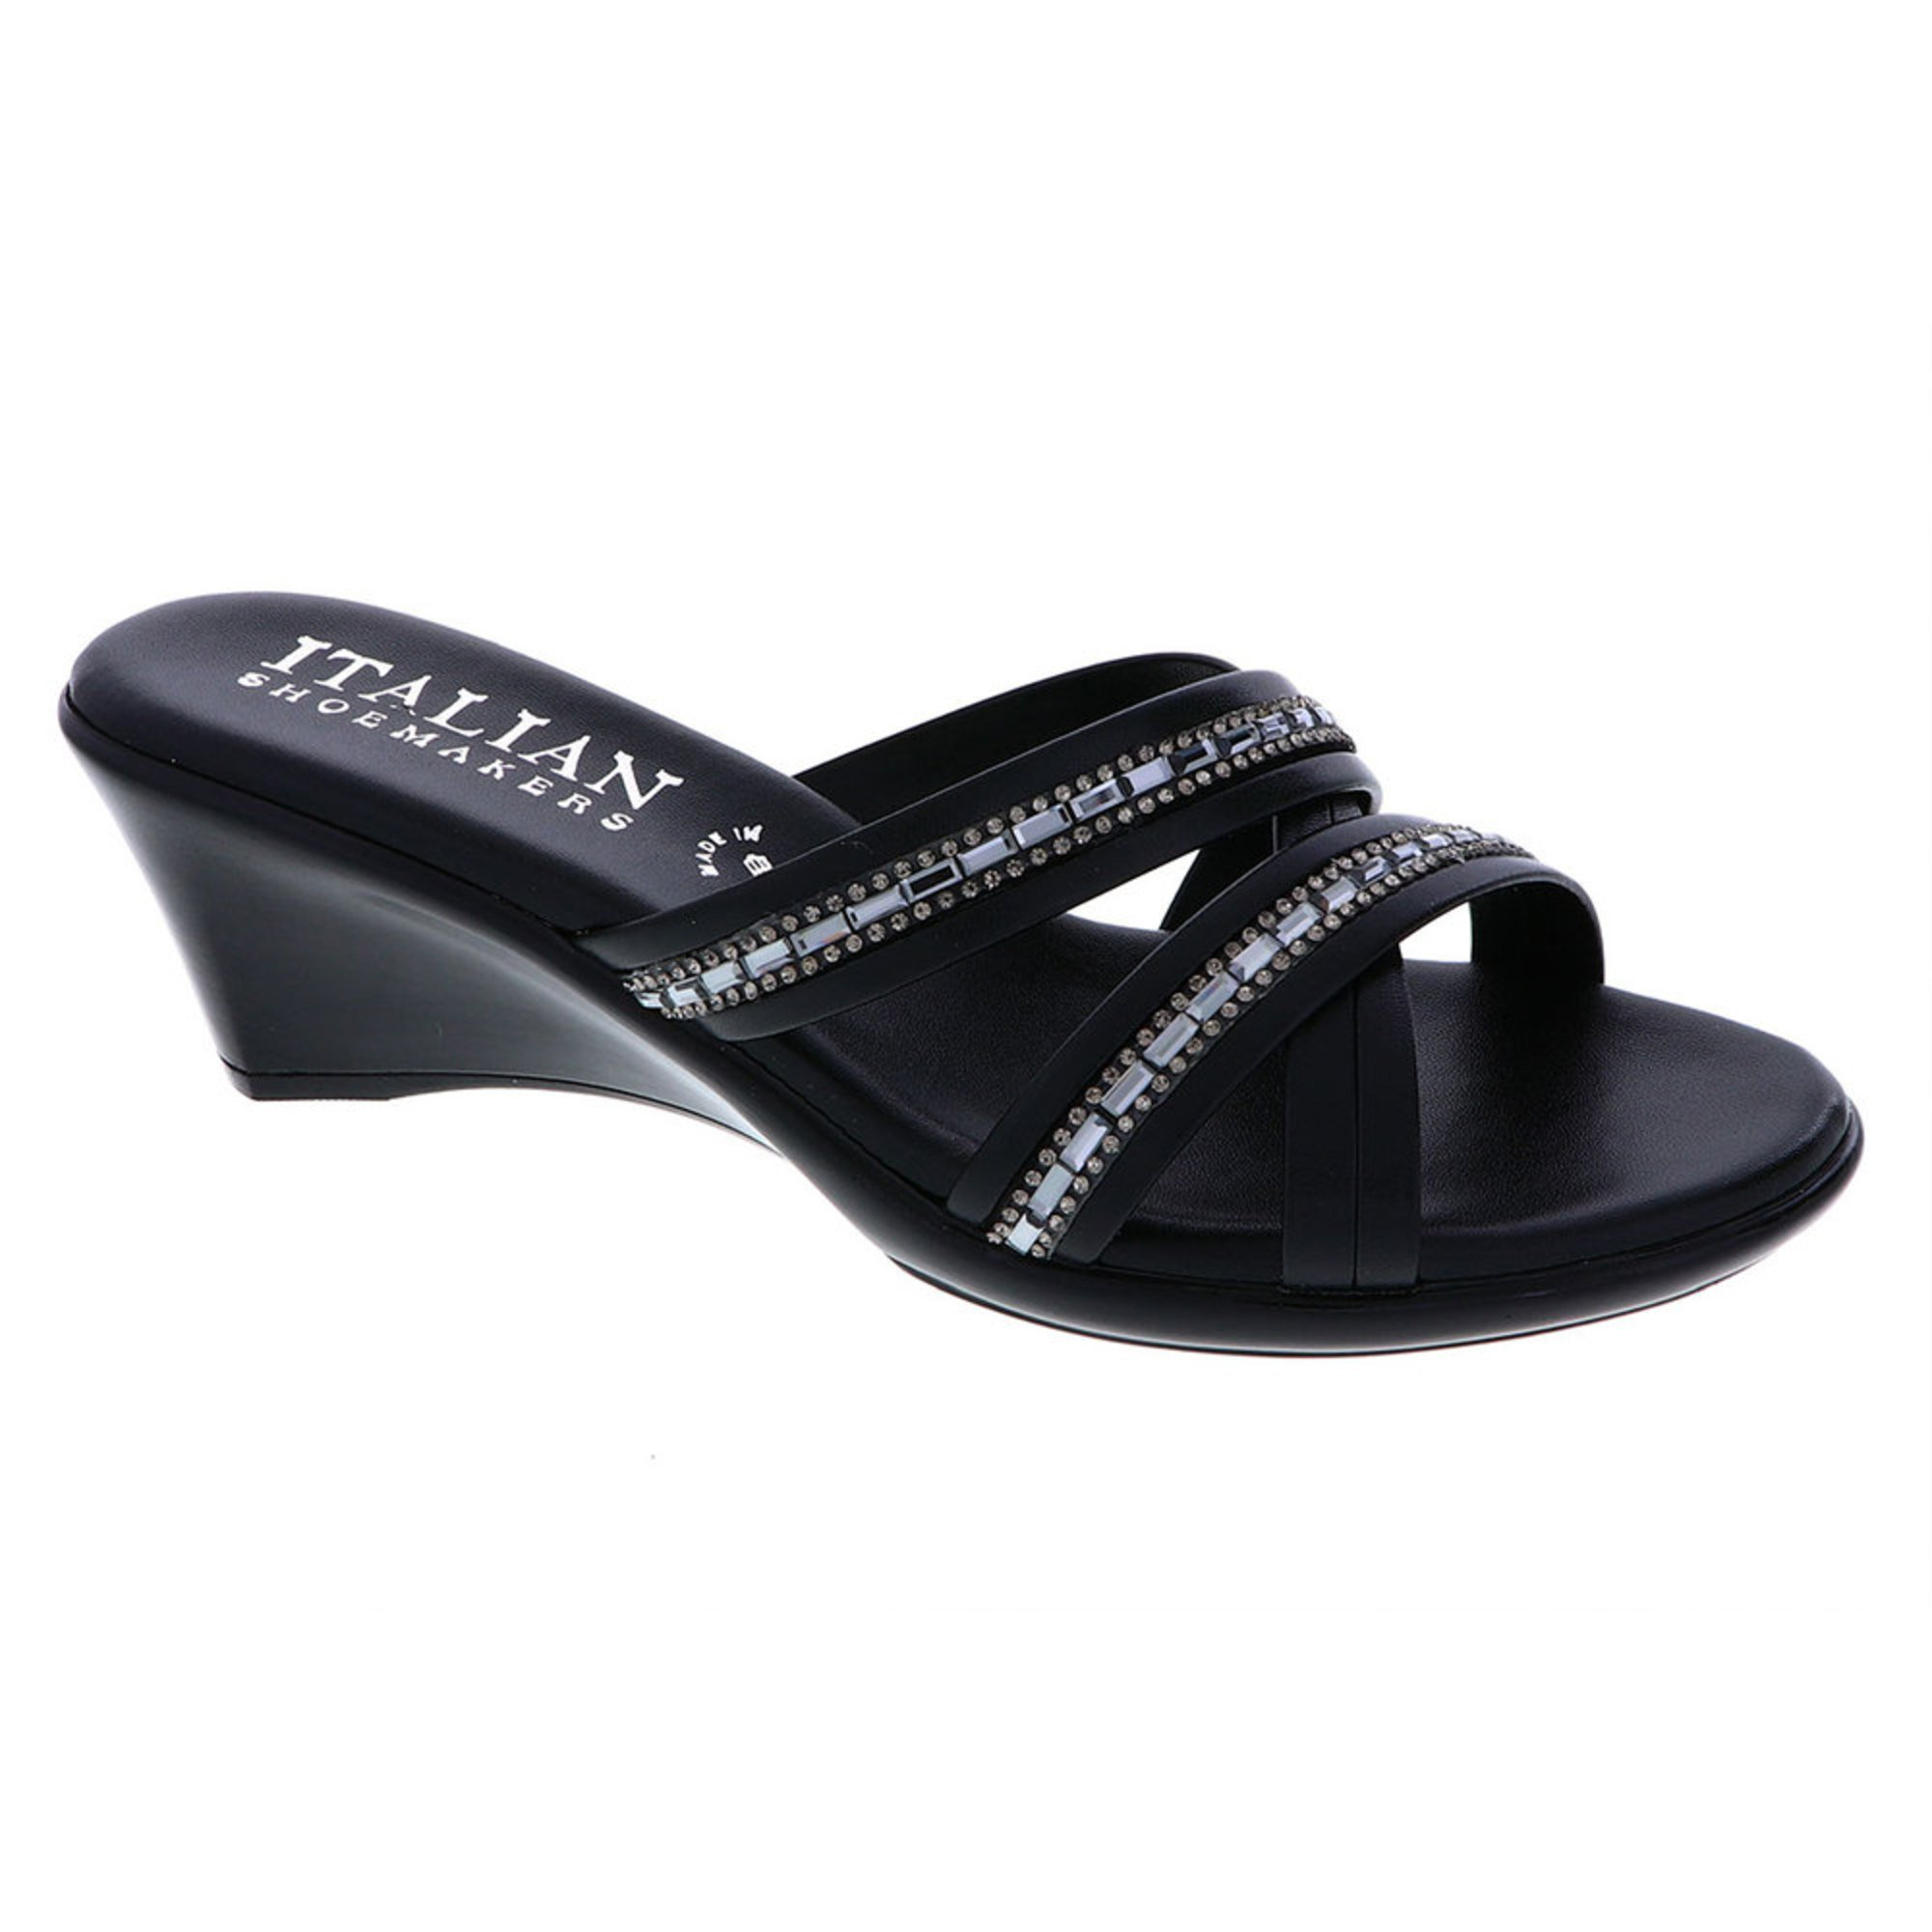 b35d6a061 Italian Shoemakers. Italian Shoemakers Women s Passion Asymmetrical Rhinestone  Sandal